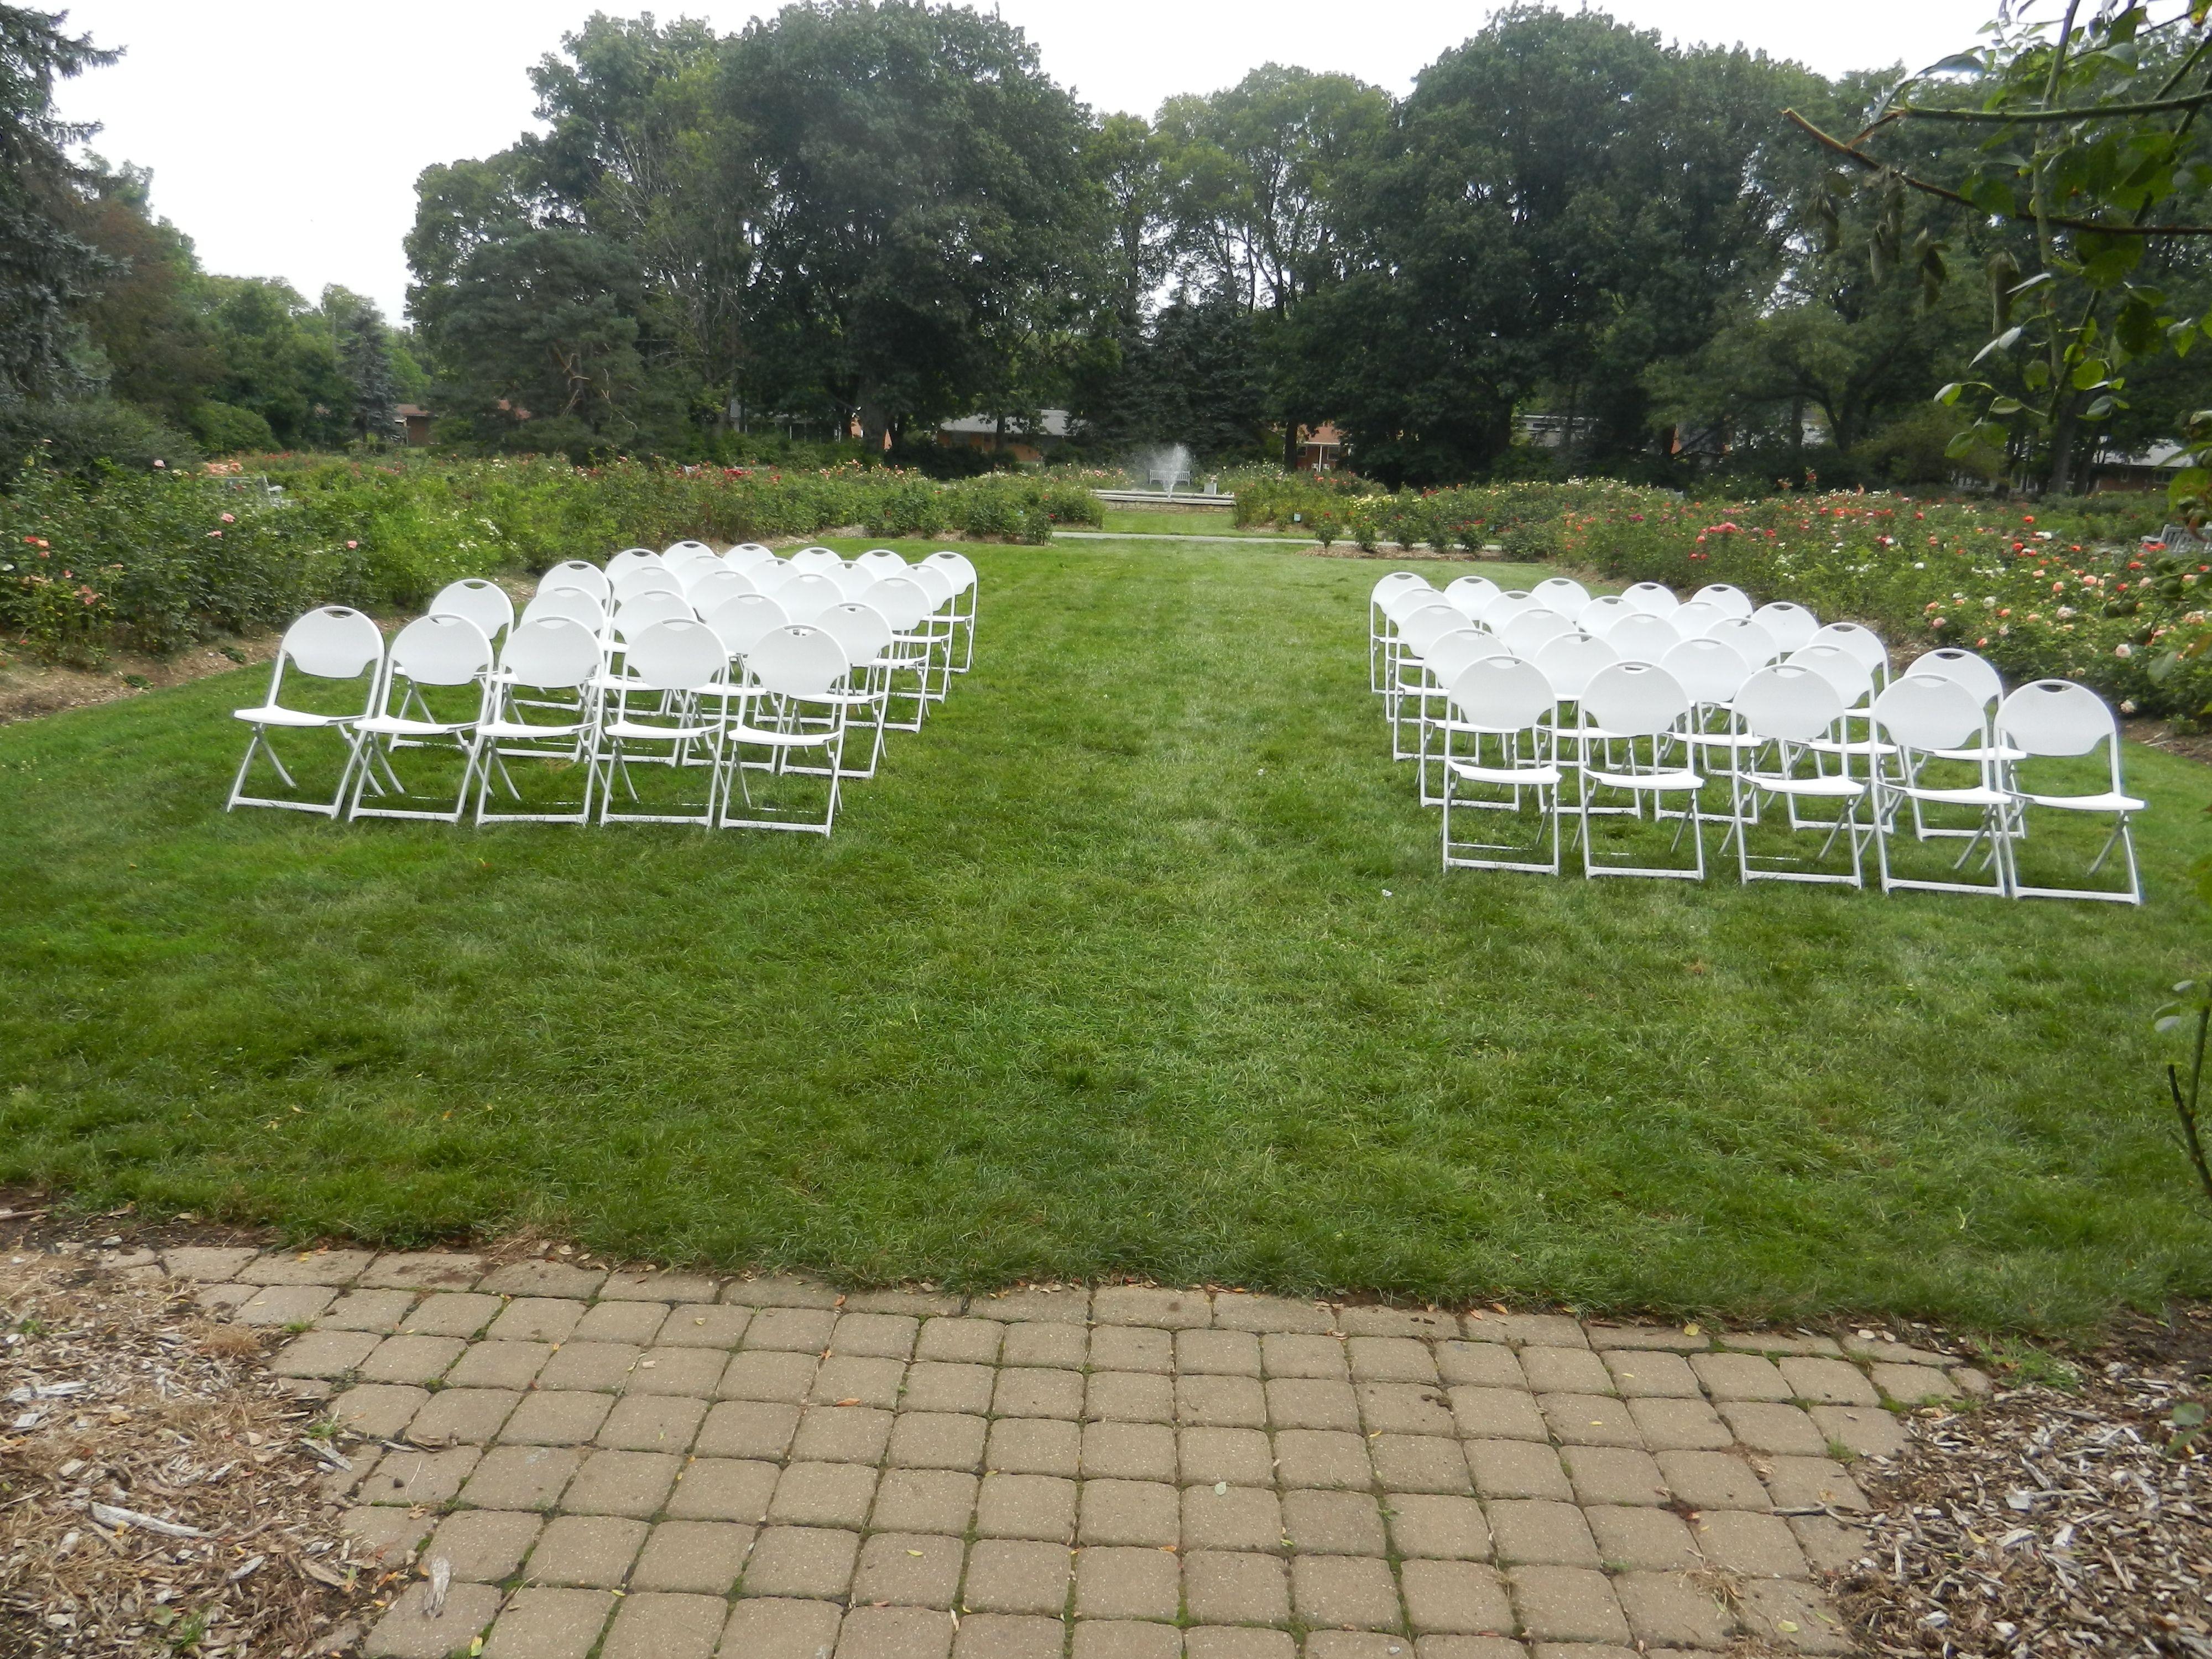 Whetstone Park Of Roses Clintonville Ohio Wedding Ceremony Decorations Ceremony Decorations Wedding Venues